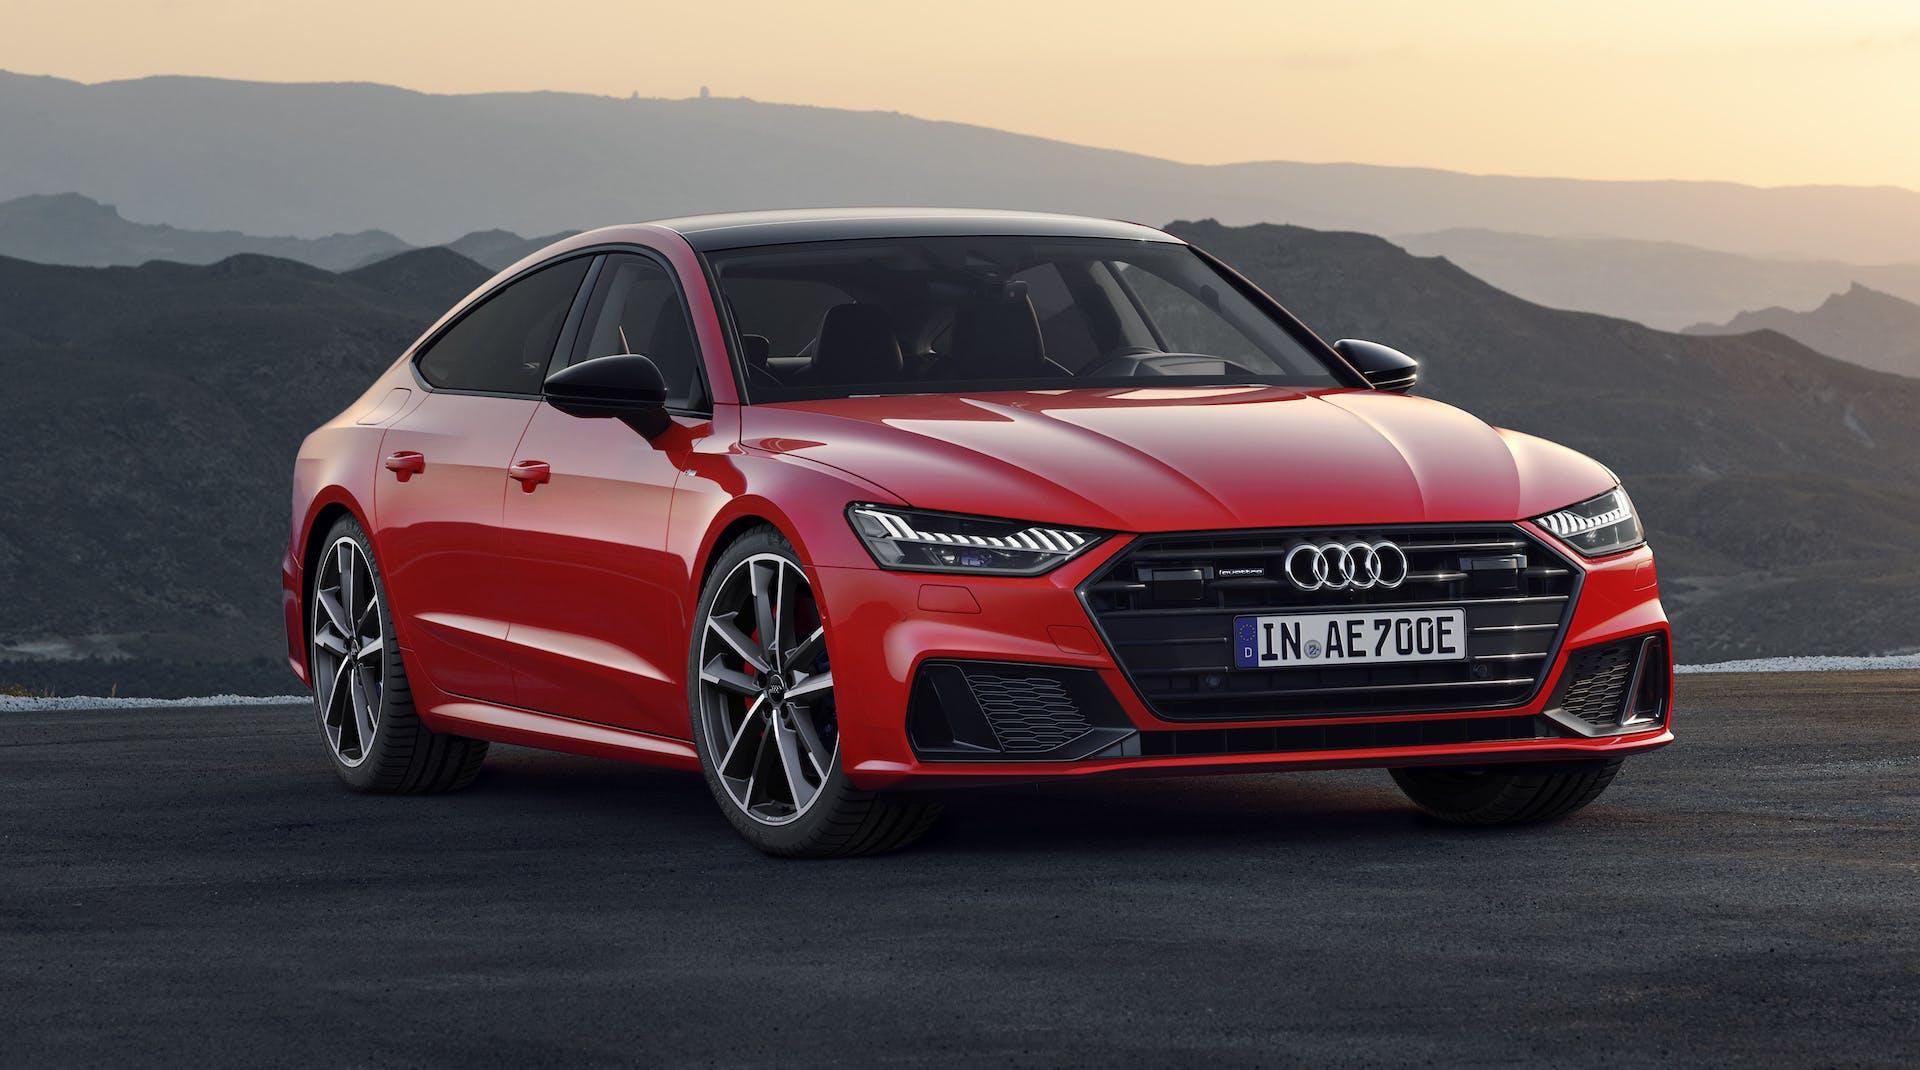 Audi A7 Sportback plug-in hybrid rosso 2019